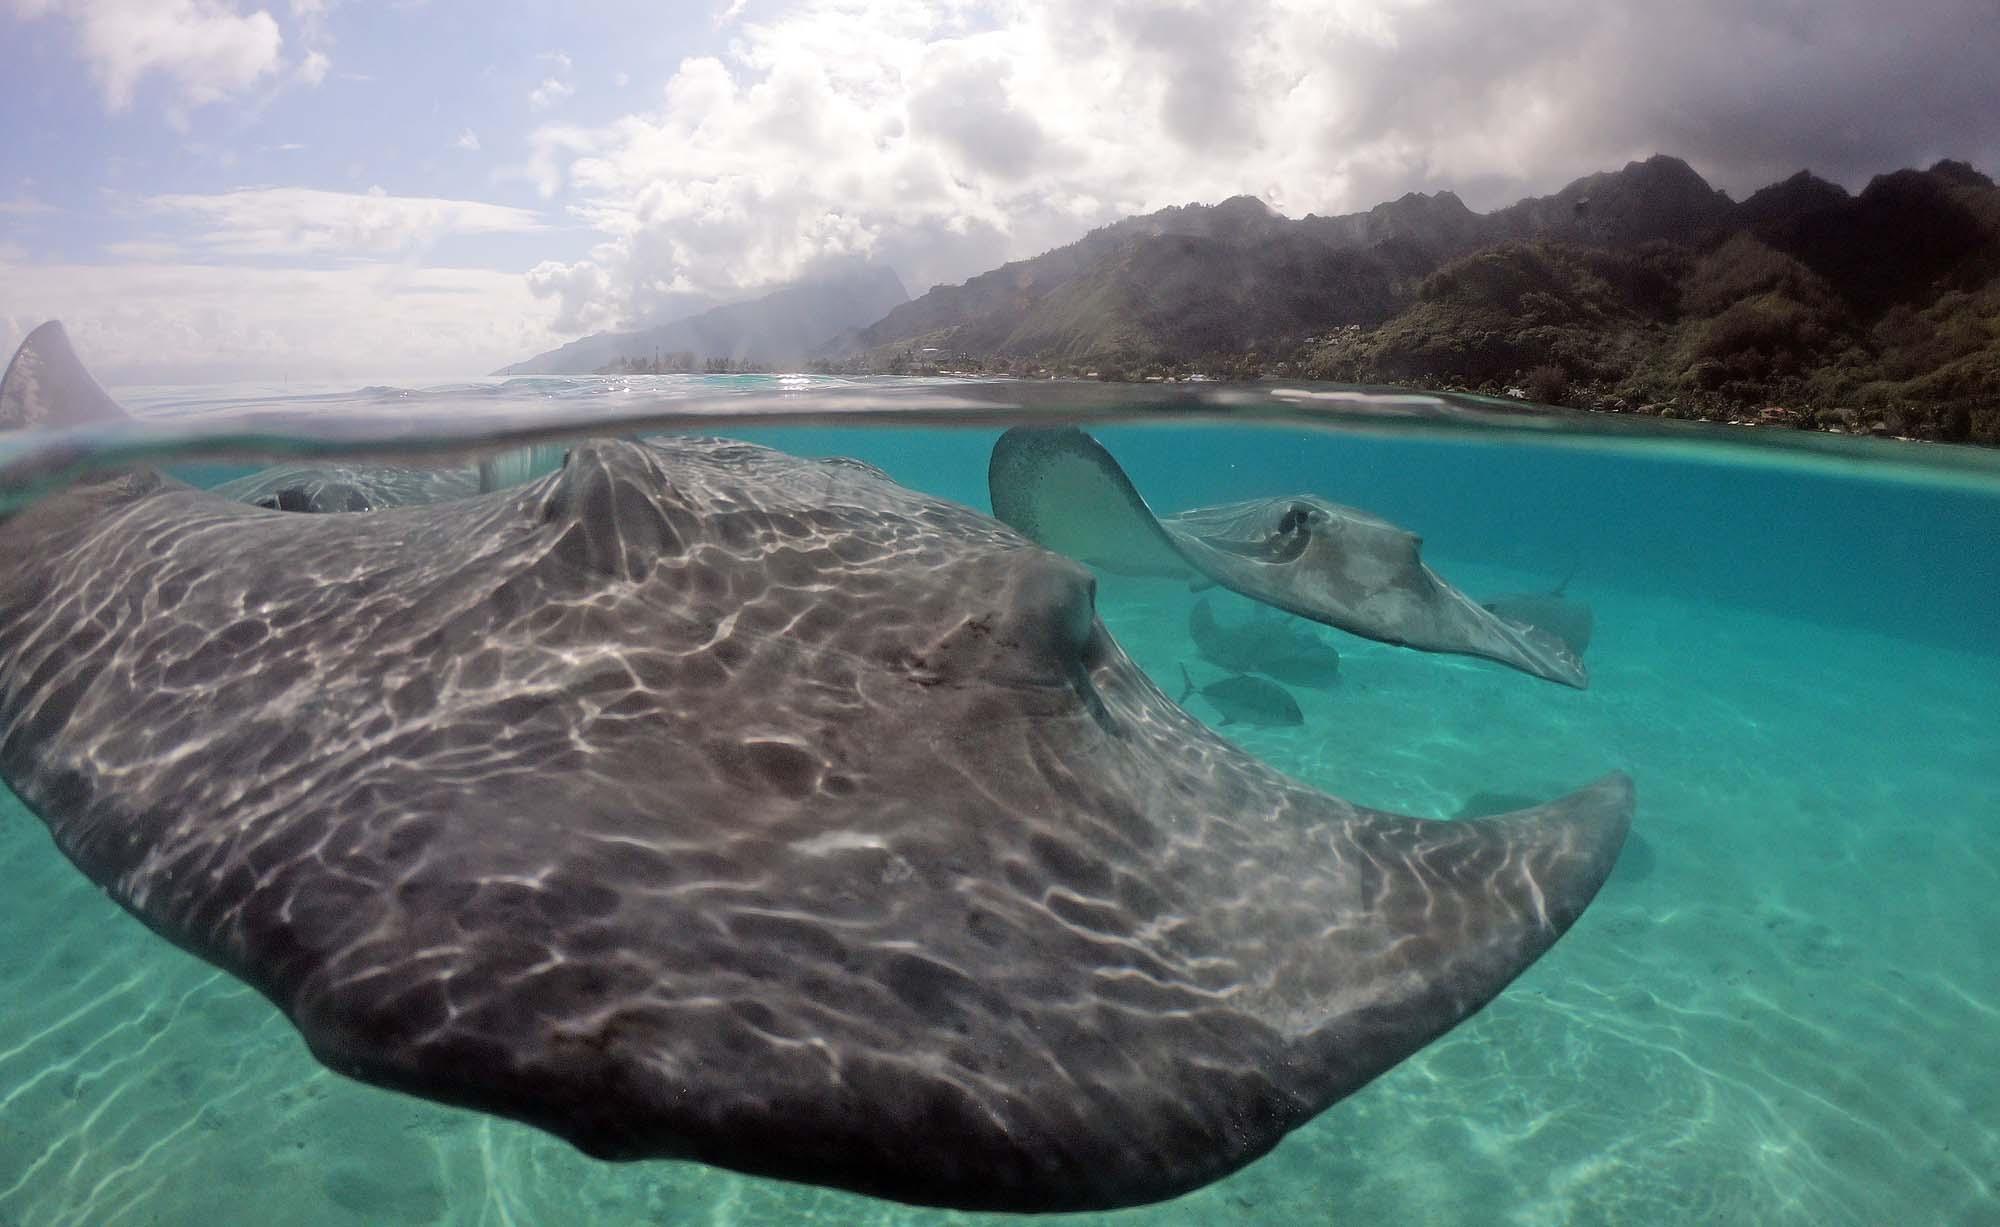 Stingrays Sharks Moorea Island French Polynesia Boat Snorkeling Tours